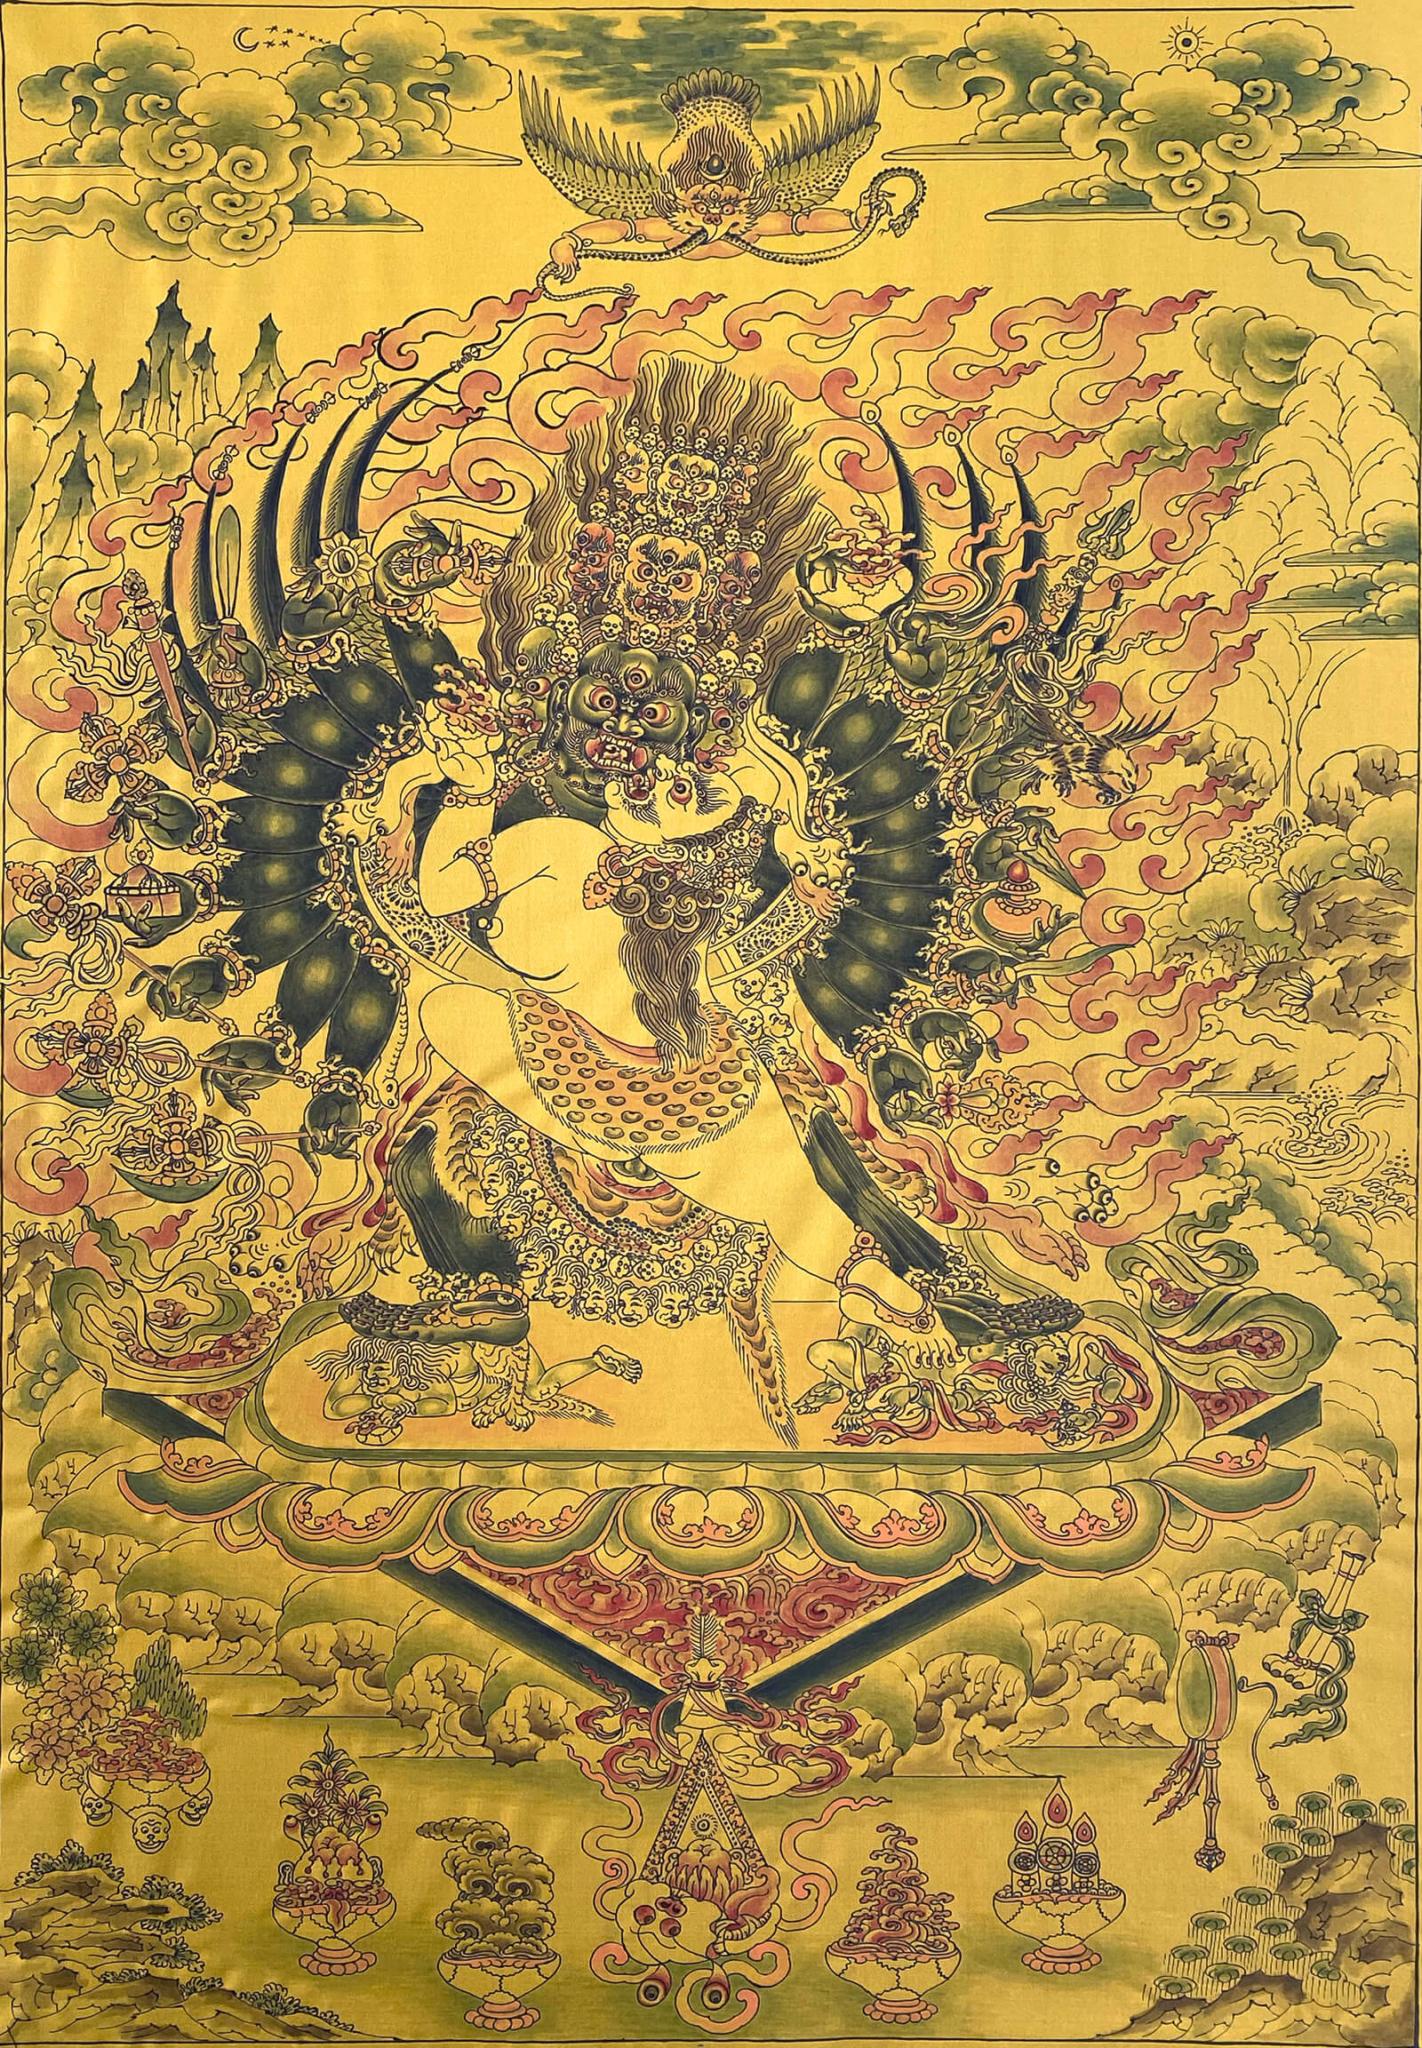 махоттаракила, тантра, дзогчен, искусство танка, дудко